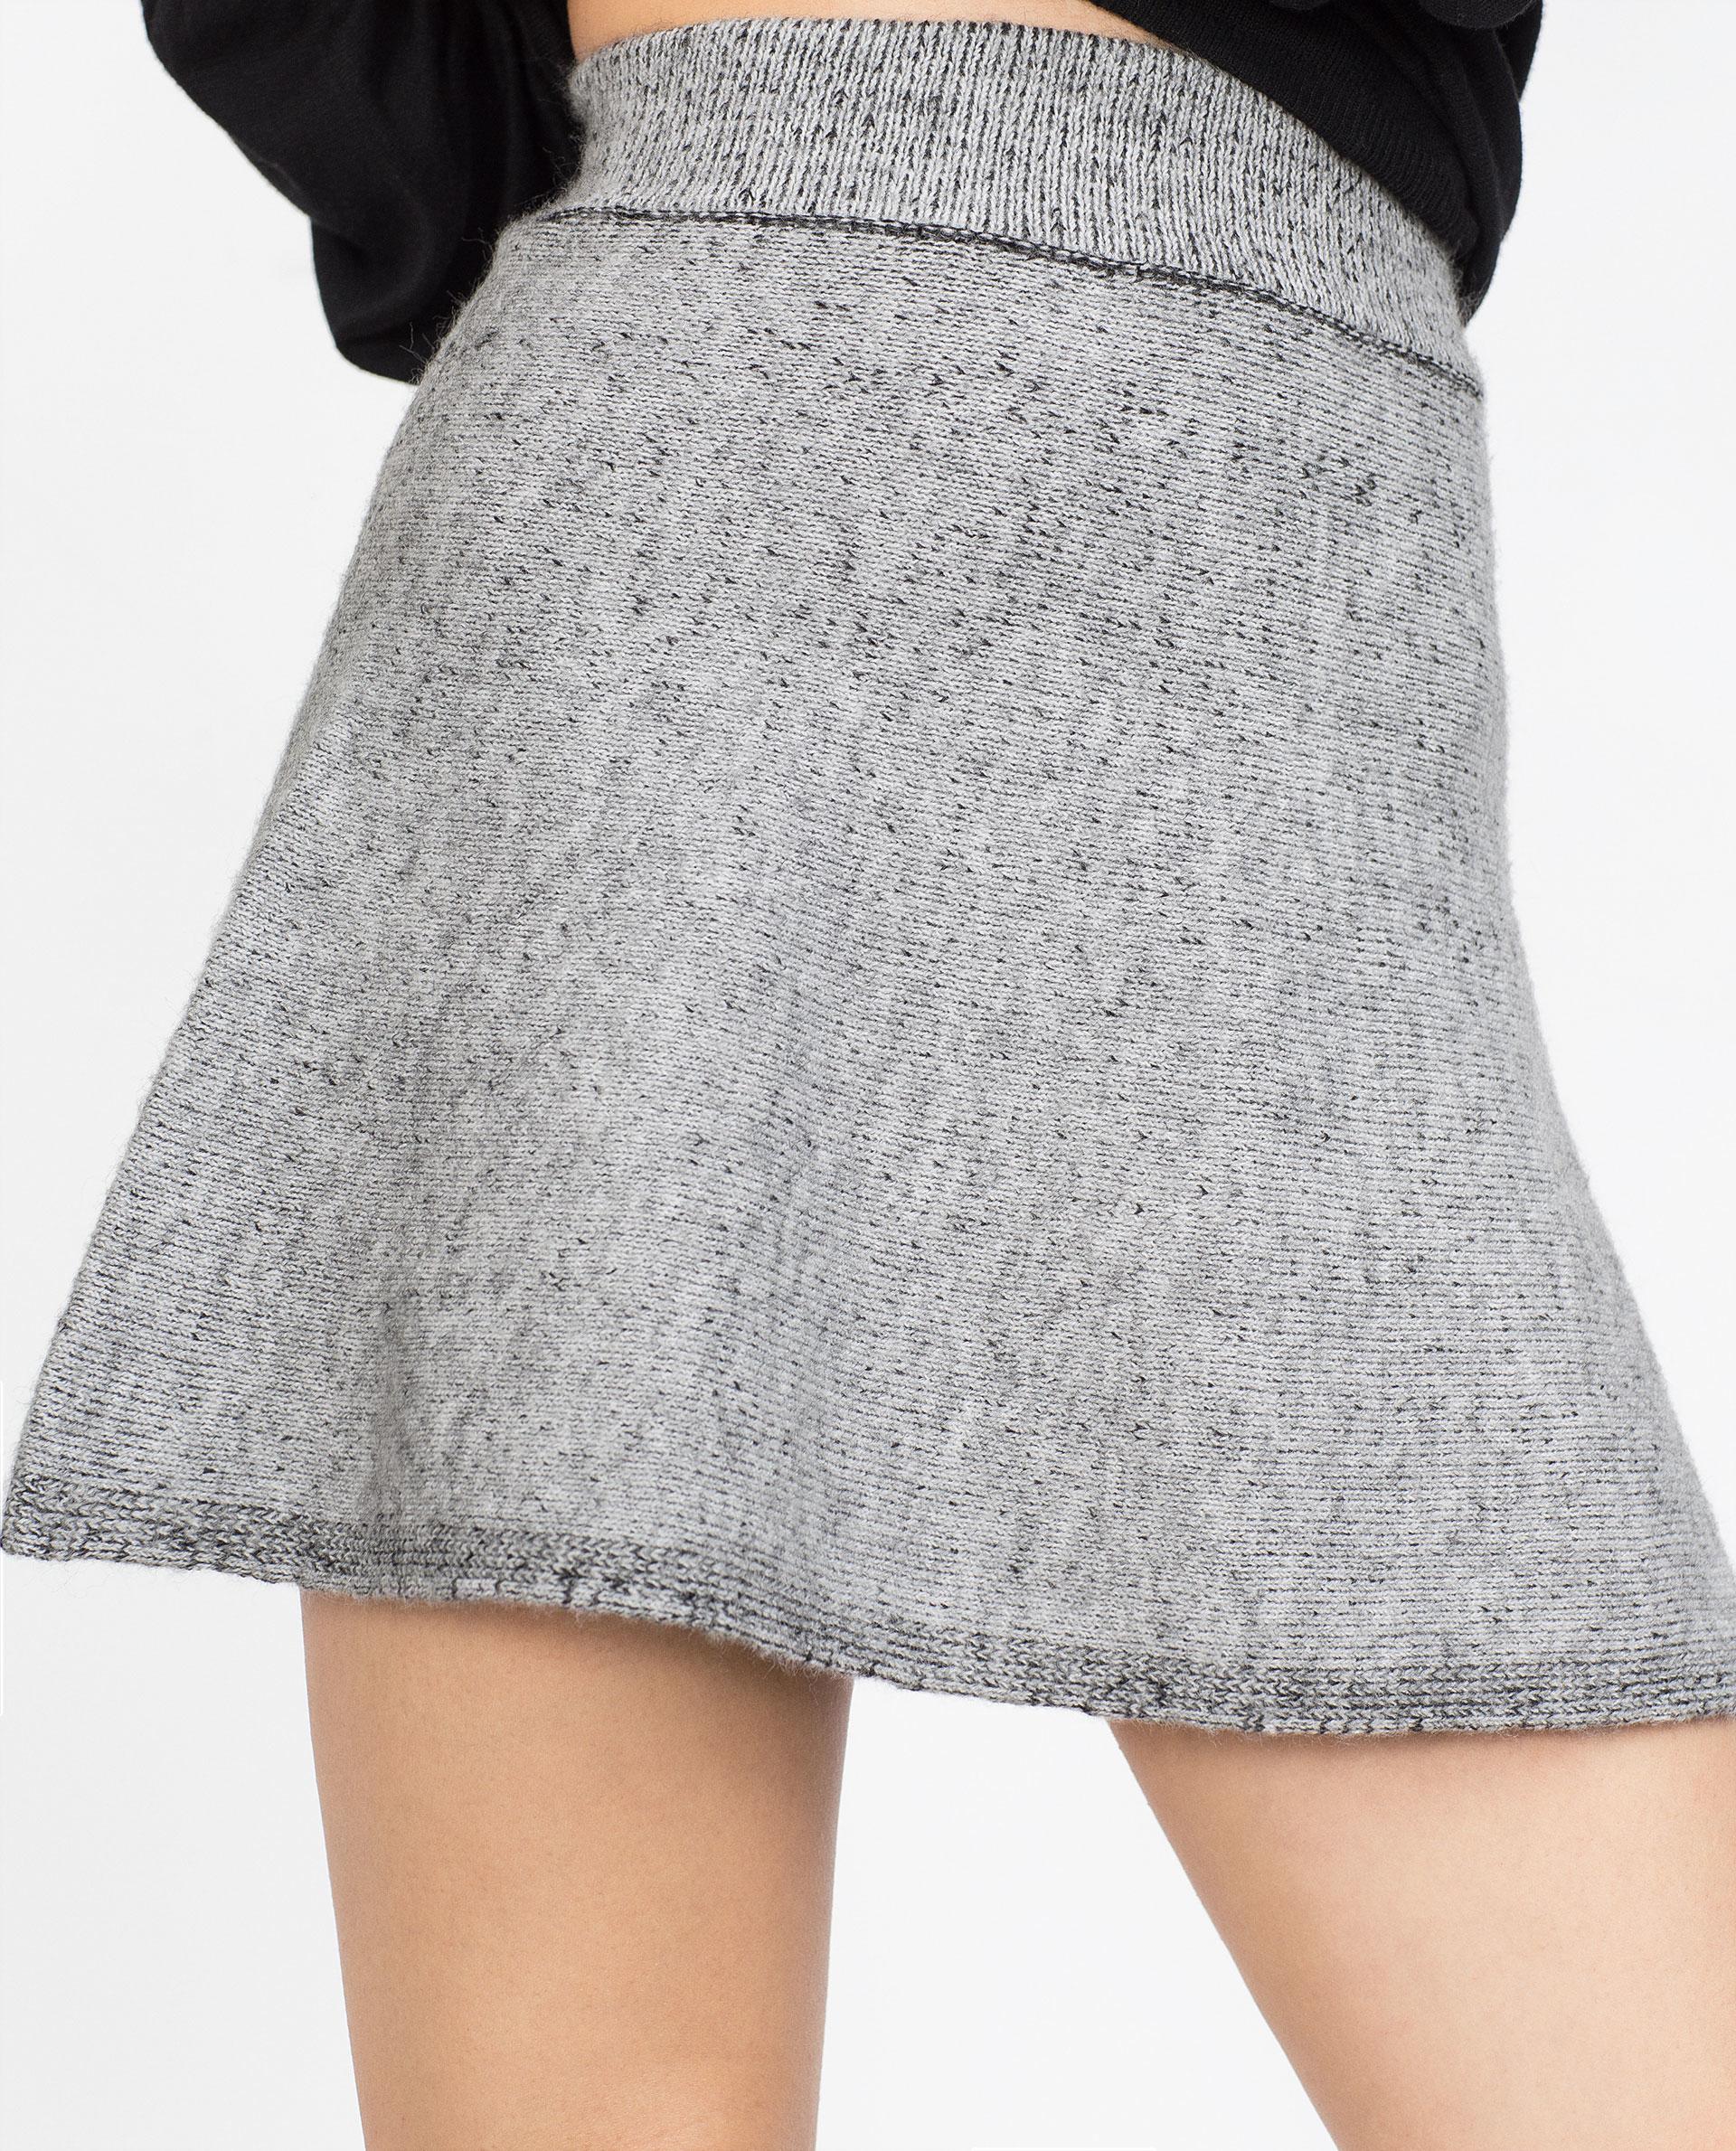 Zara Flared Miniskirt in Gray | Lyst